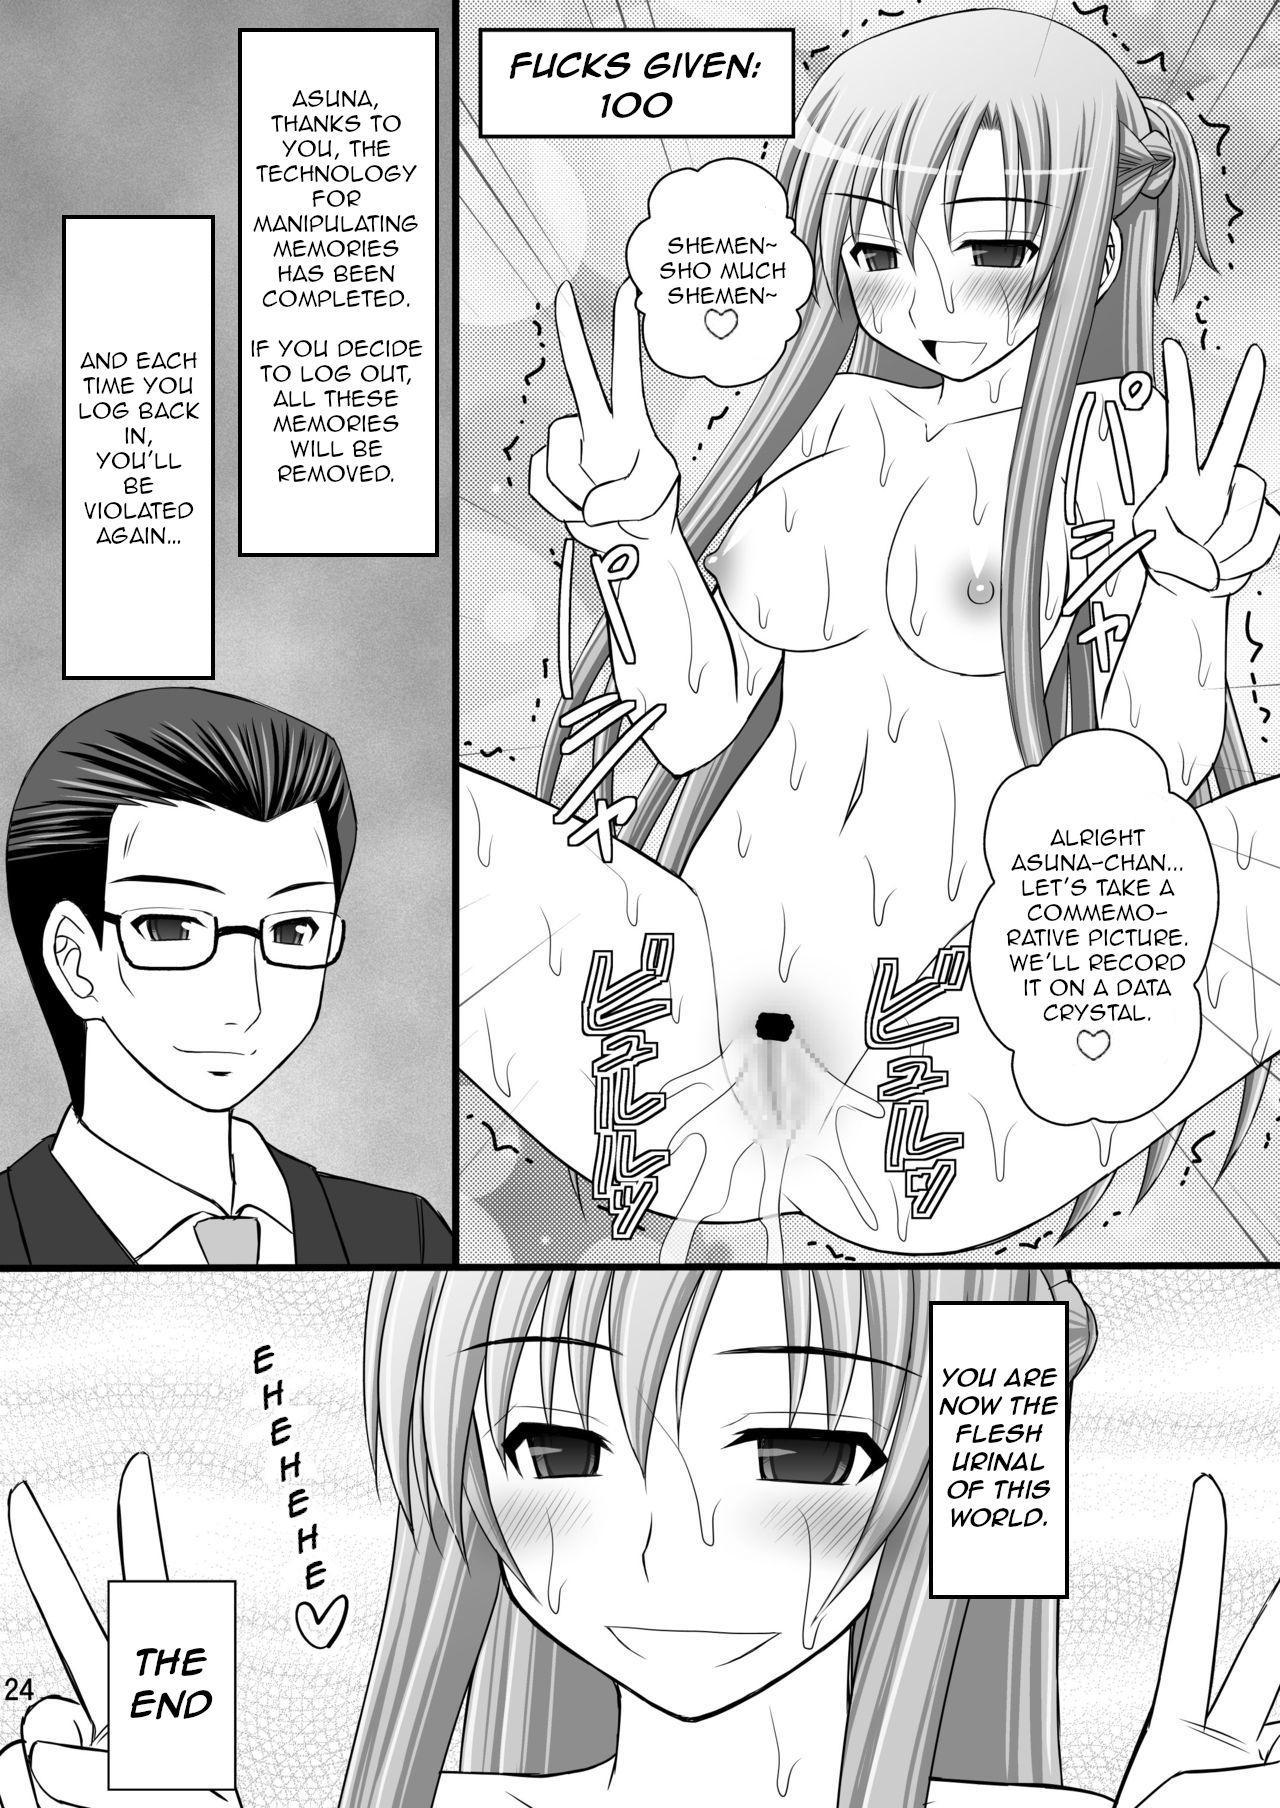 [Asanoya (Kittsu)] Toraware Hime III - Asuna Nakadashi 100-nin Dekiru ka na   Hostage Princess III (Sword Art Online) [English] [HypnoMangaEditor] [Digital] 22